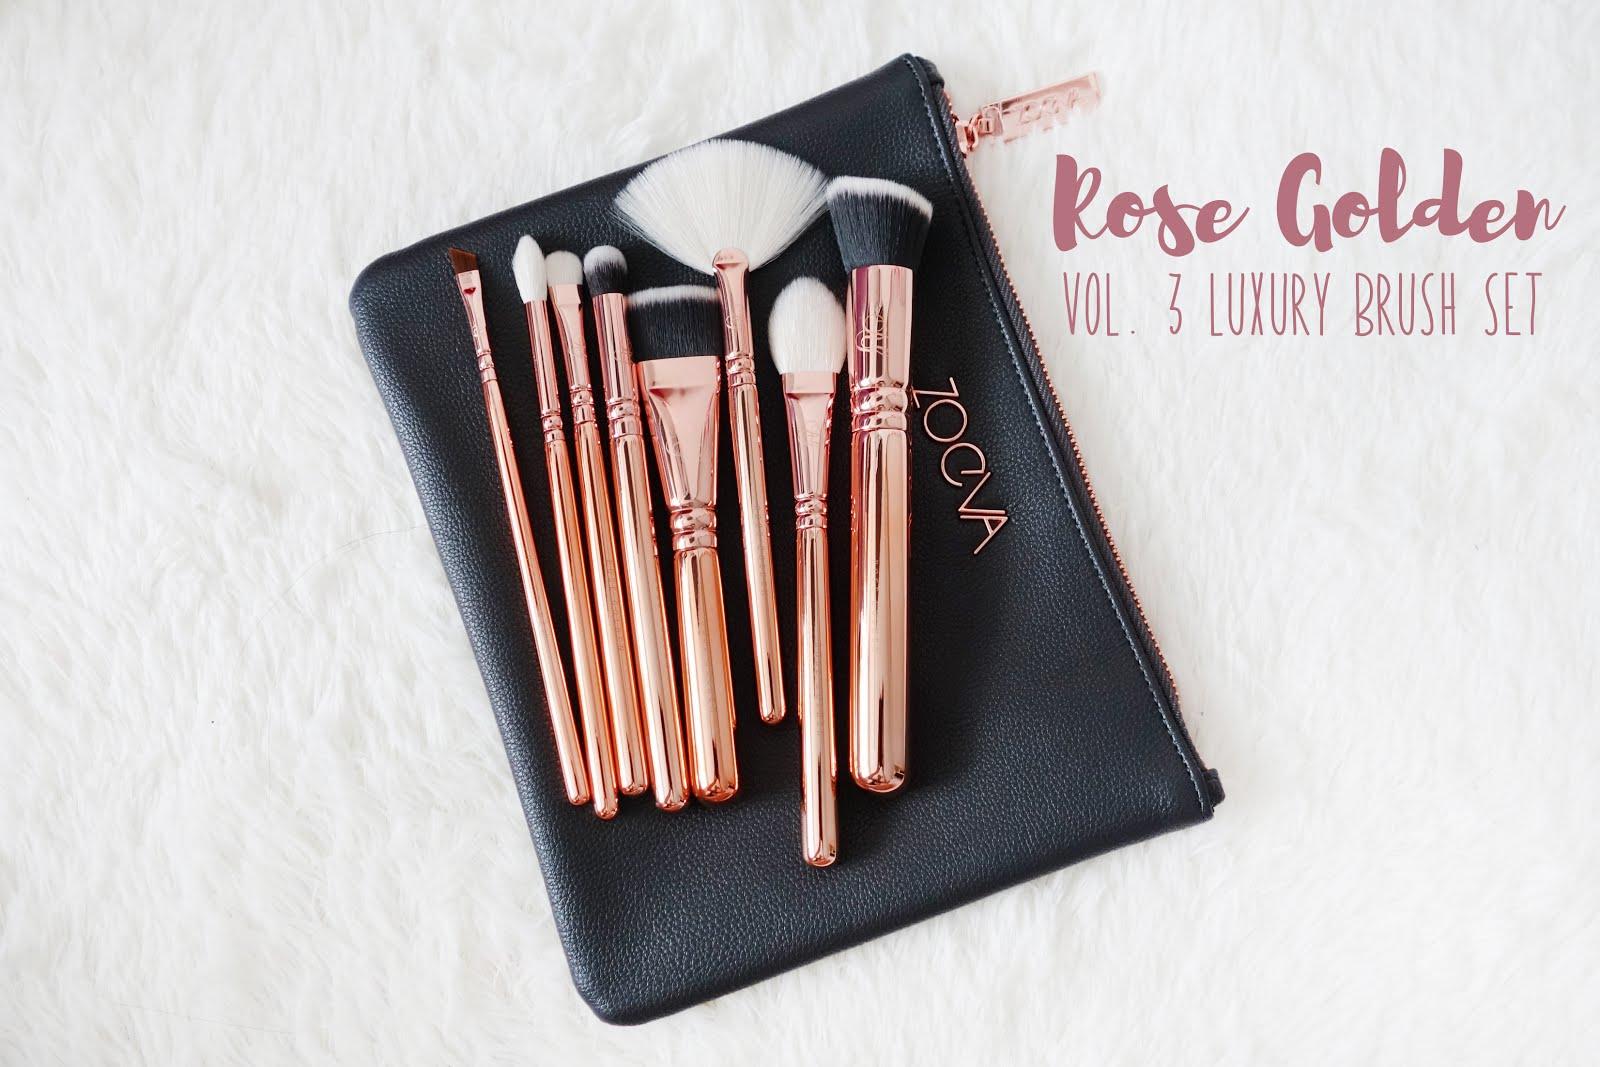 Zoeva Rose Golden Vol 3 Luxury Brush Set Blush Dark Brown 8 Piece Bursh Bag Palette